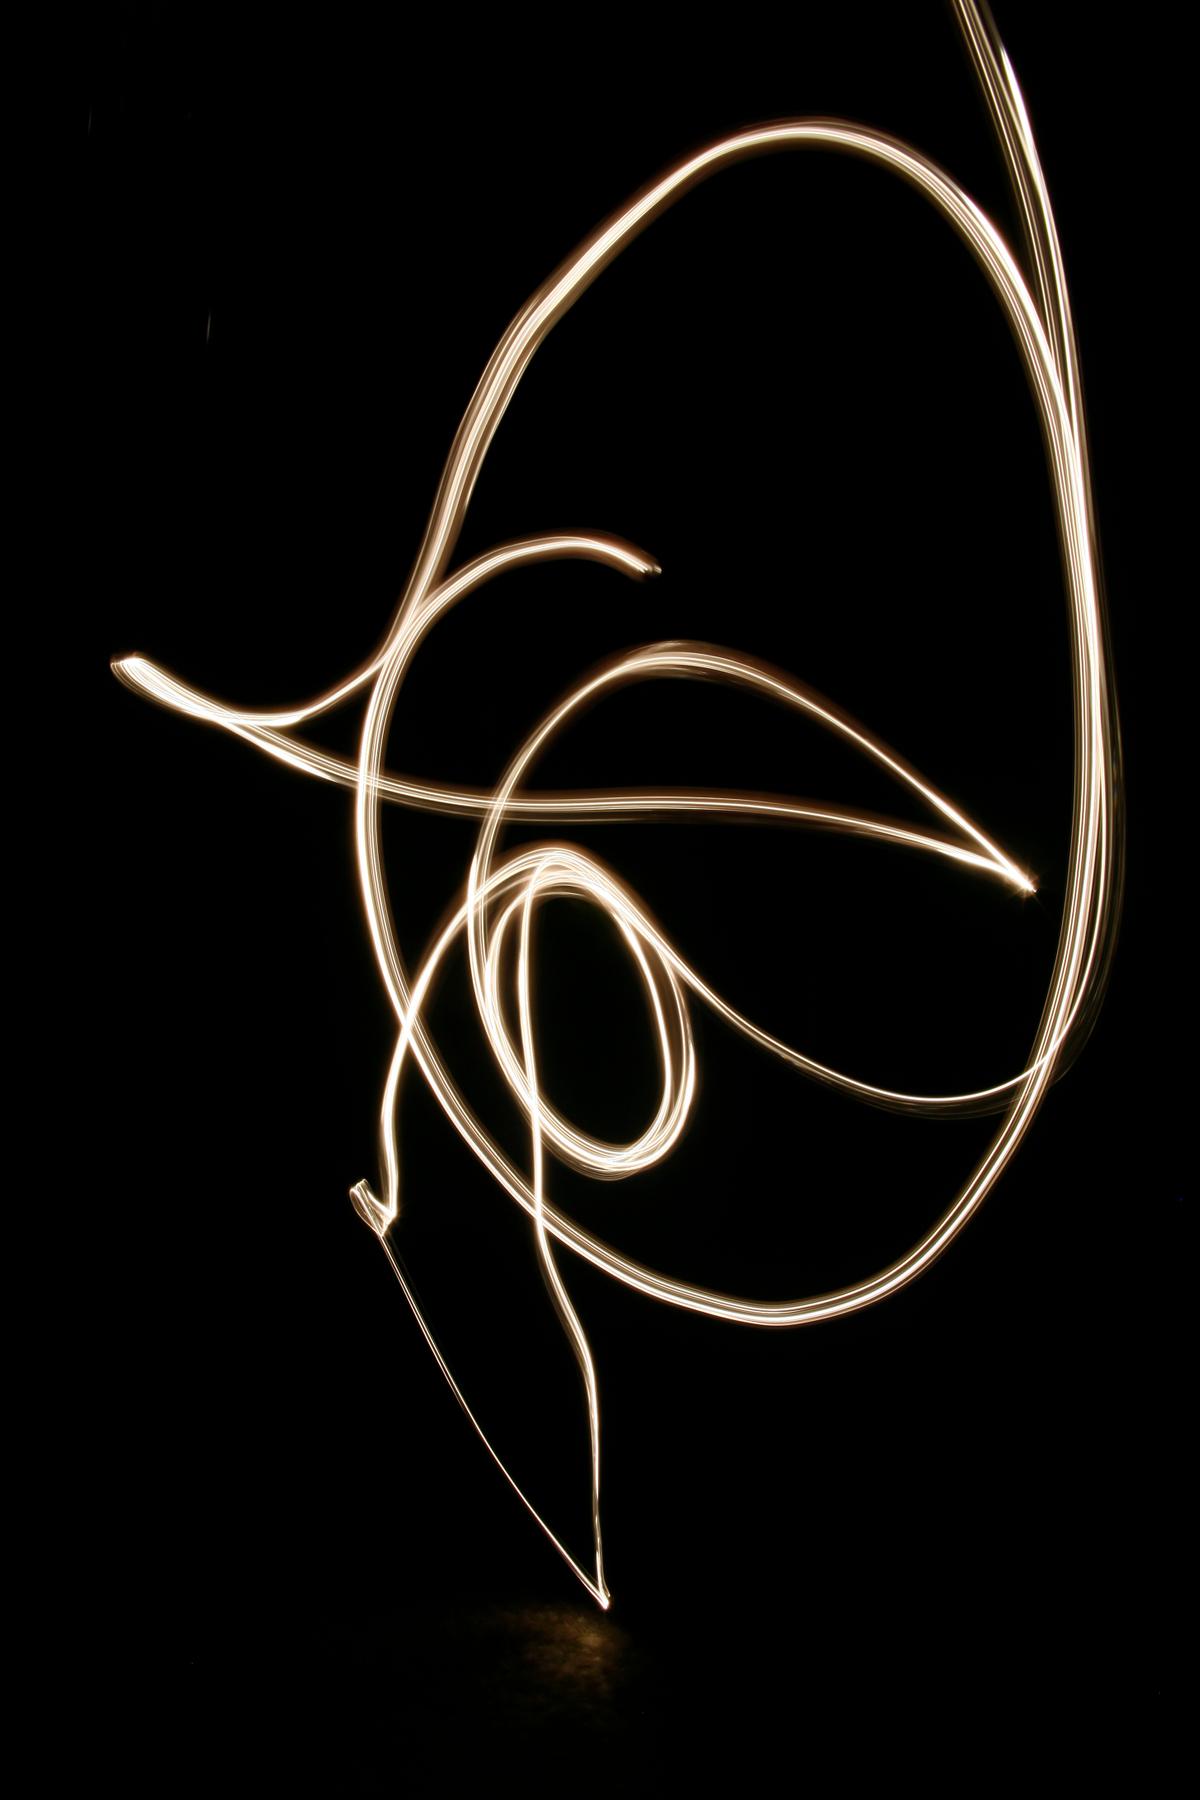 Gold Grafitti, 2008, Abstract Photography, Shirine Gill